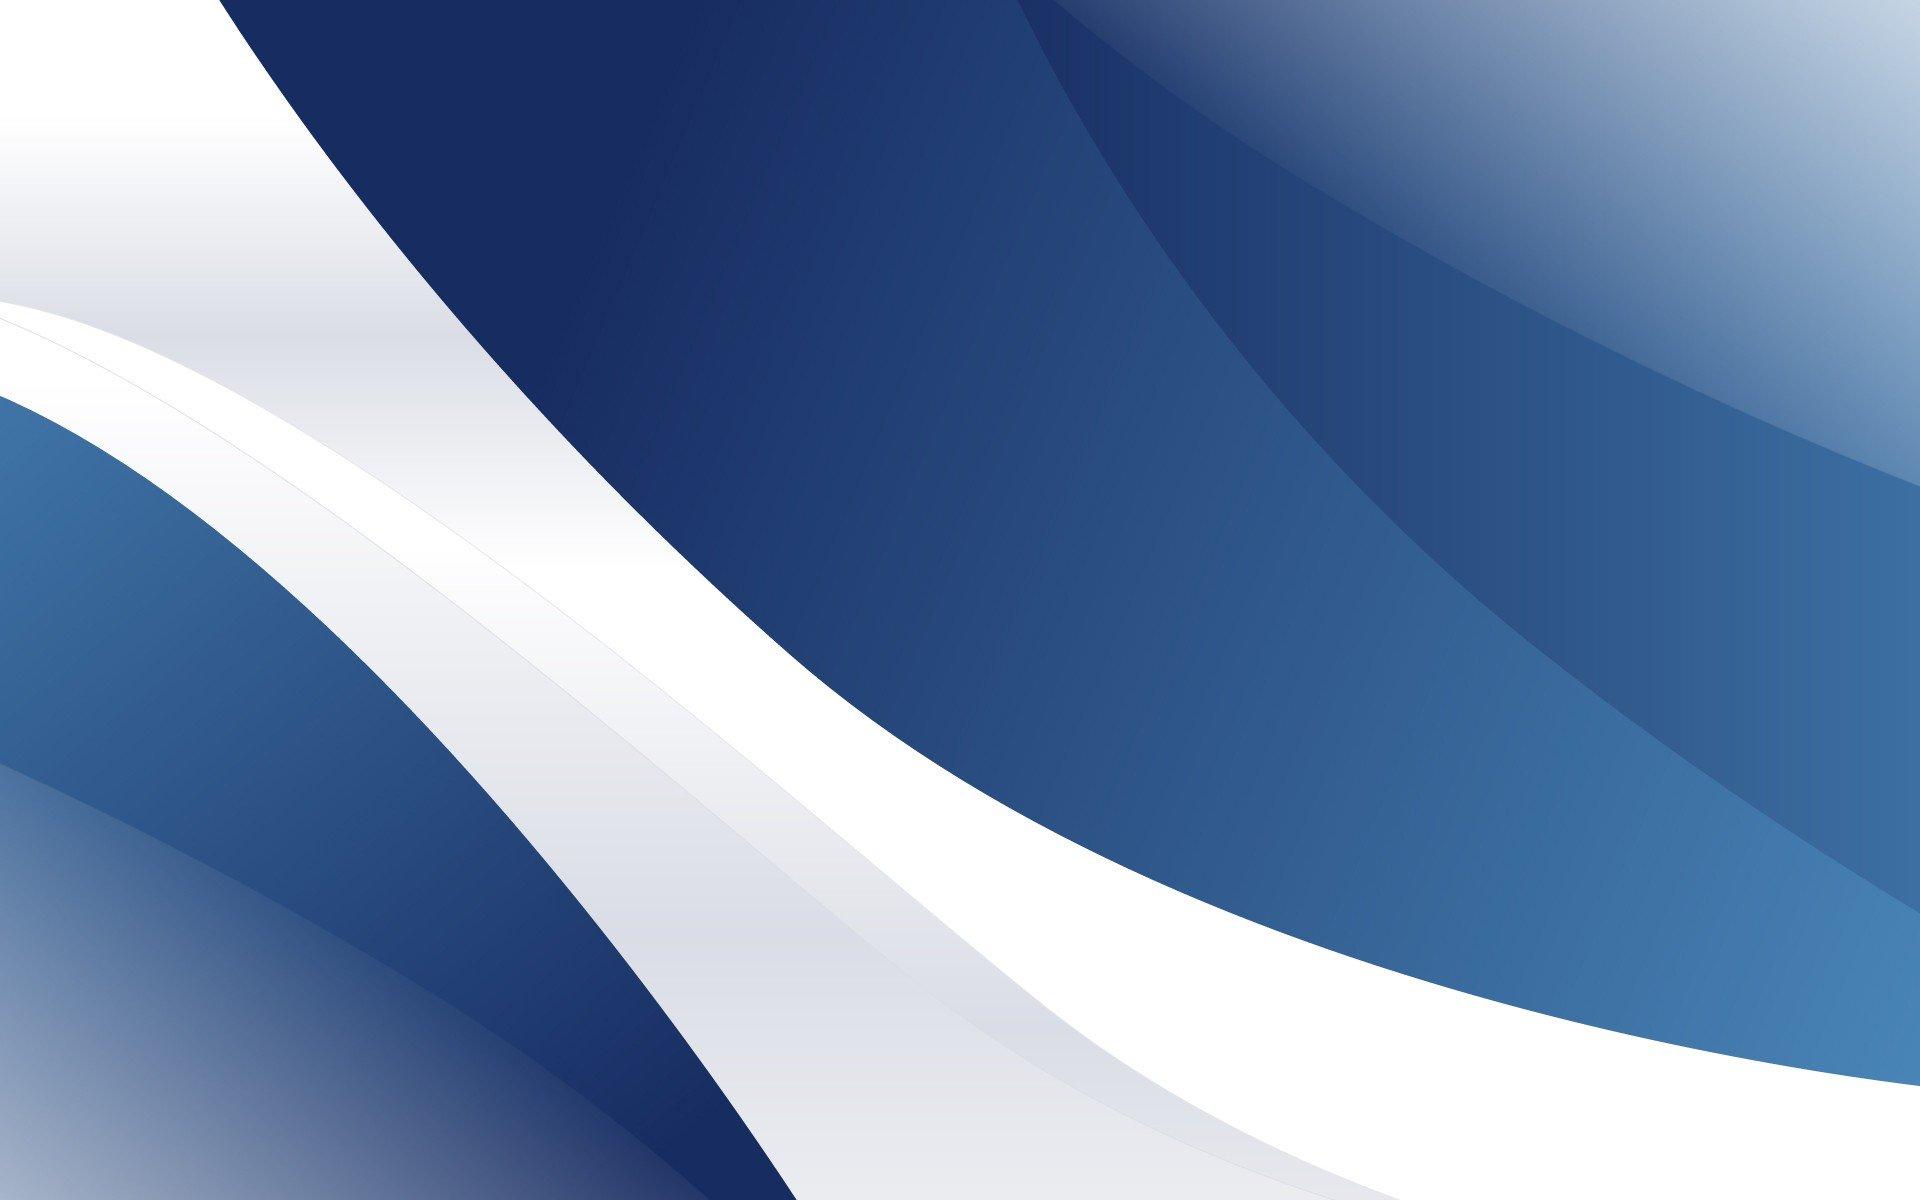 Hd Wallpaper 1920x1080 Black Blue: Blue And White HD Wallpaper